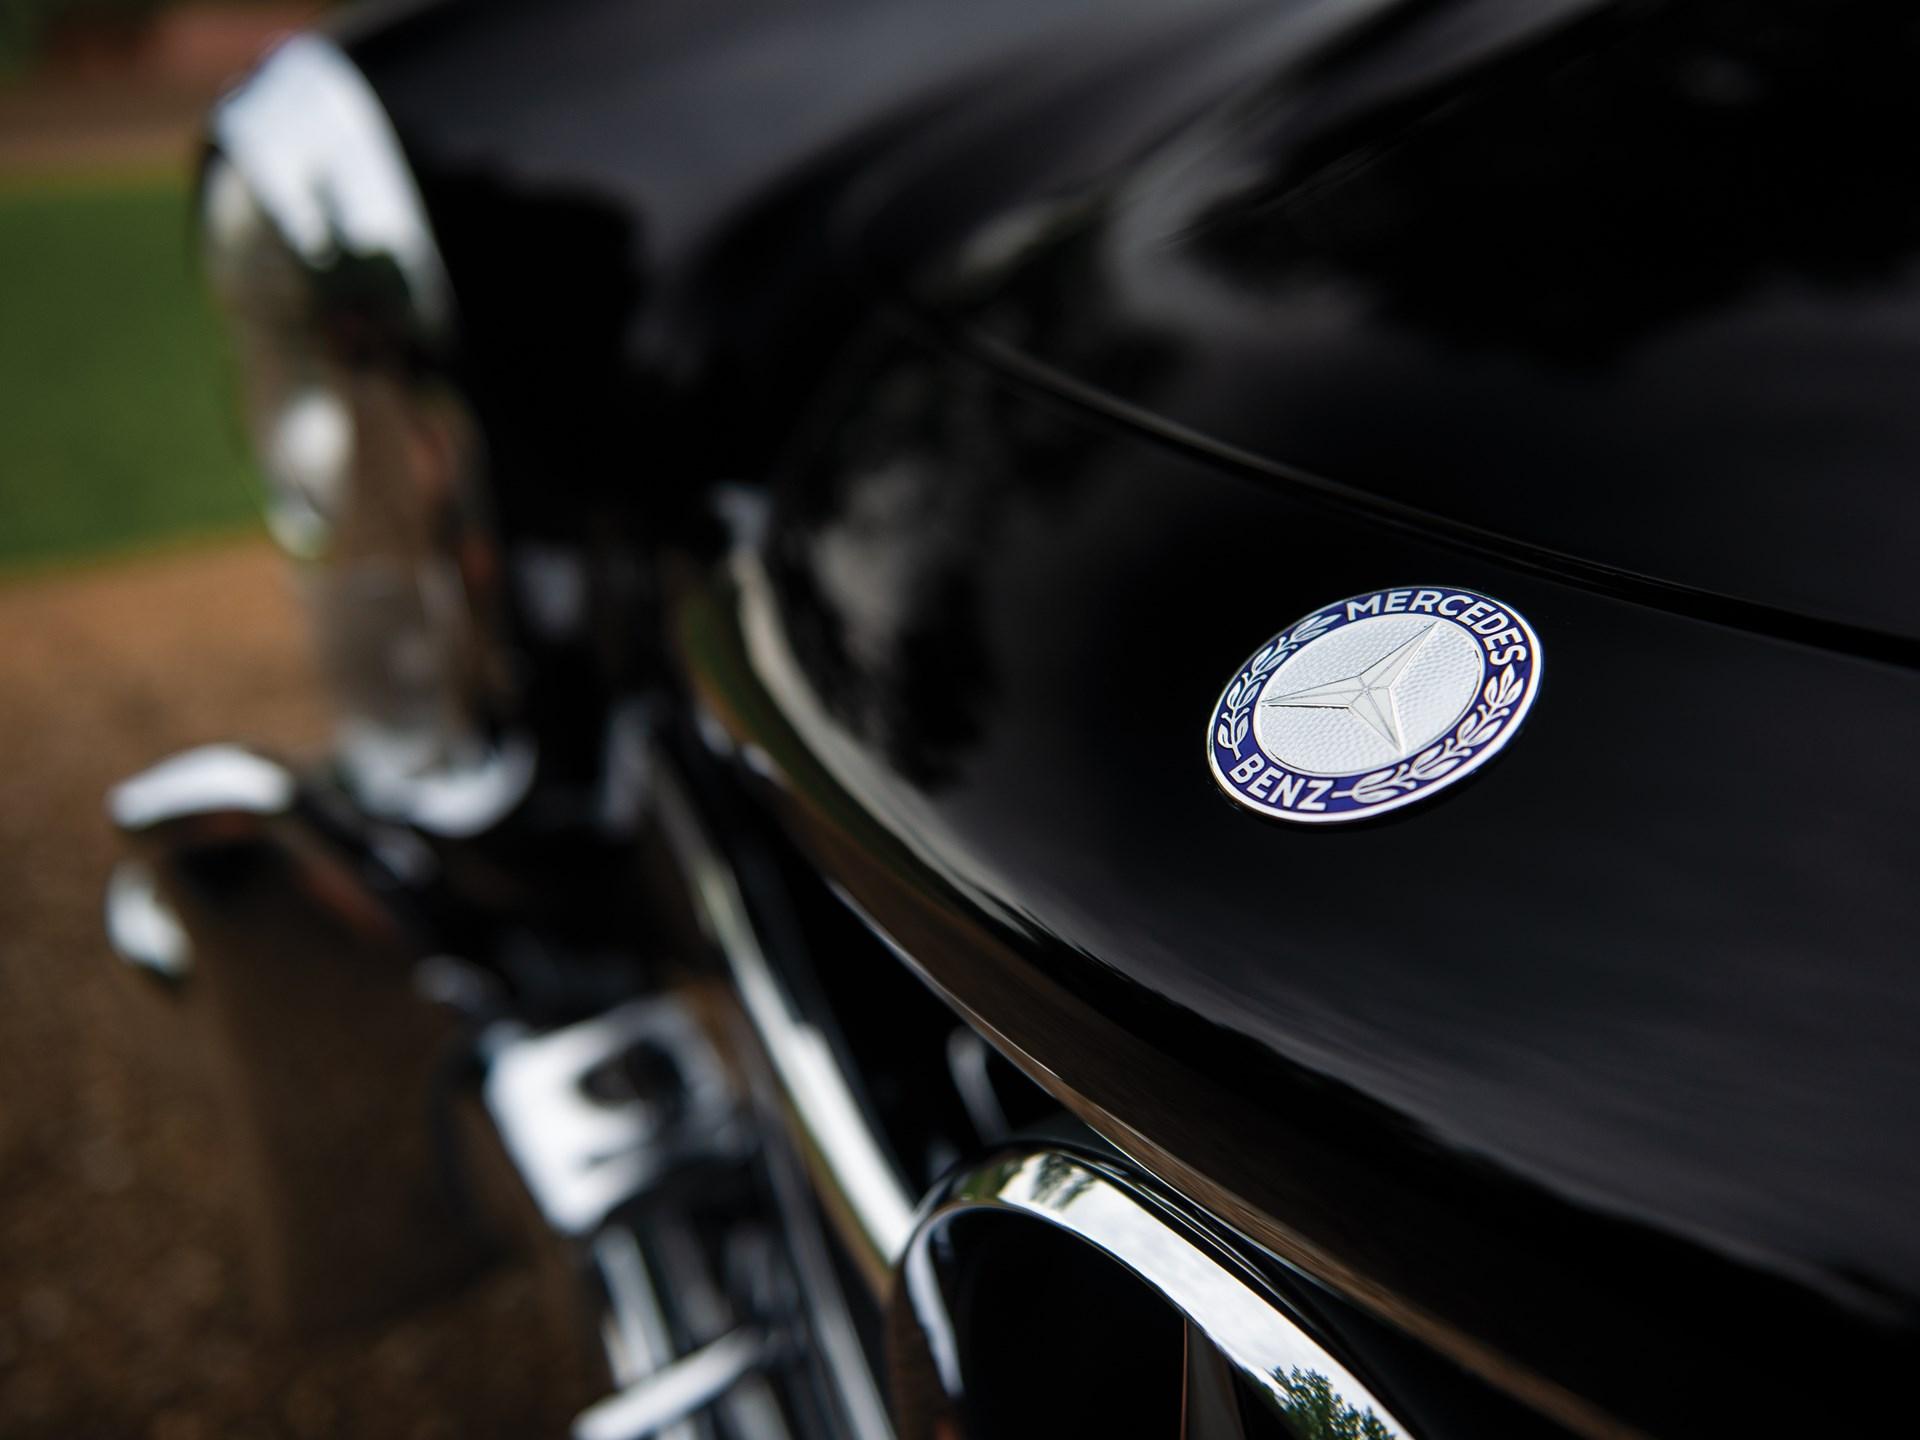 1963 Mercedes-Benz 300 SL Roadster